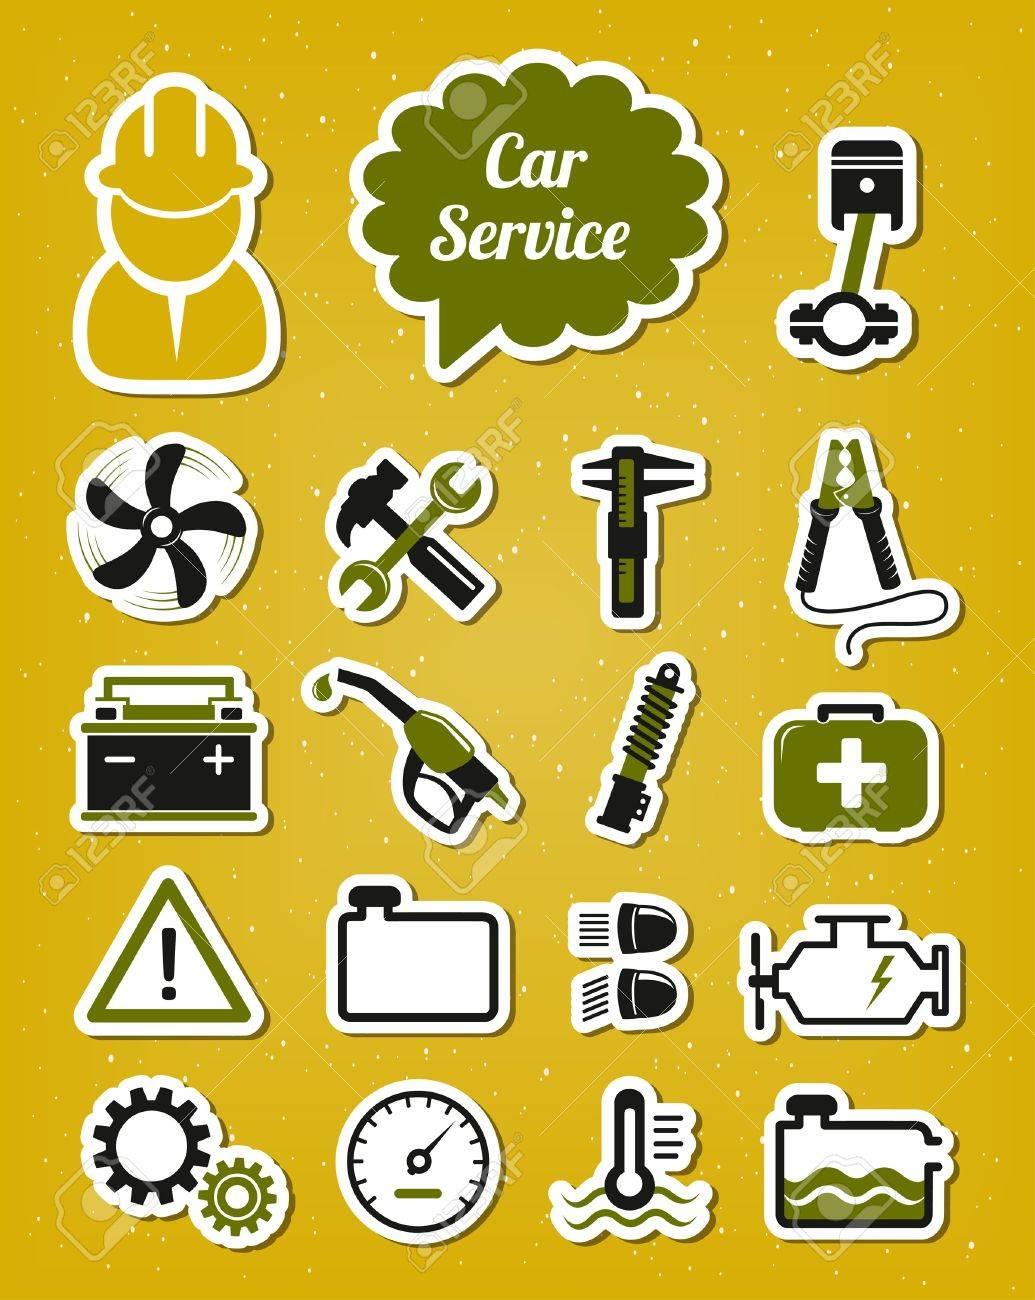 Car service icons Stock Vector - 18093333